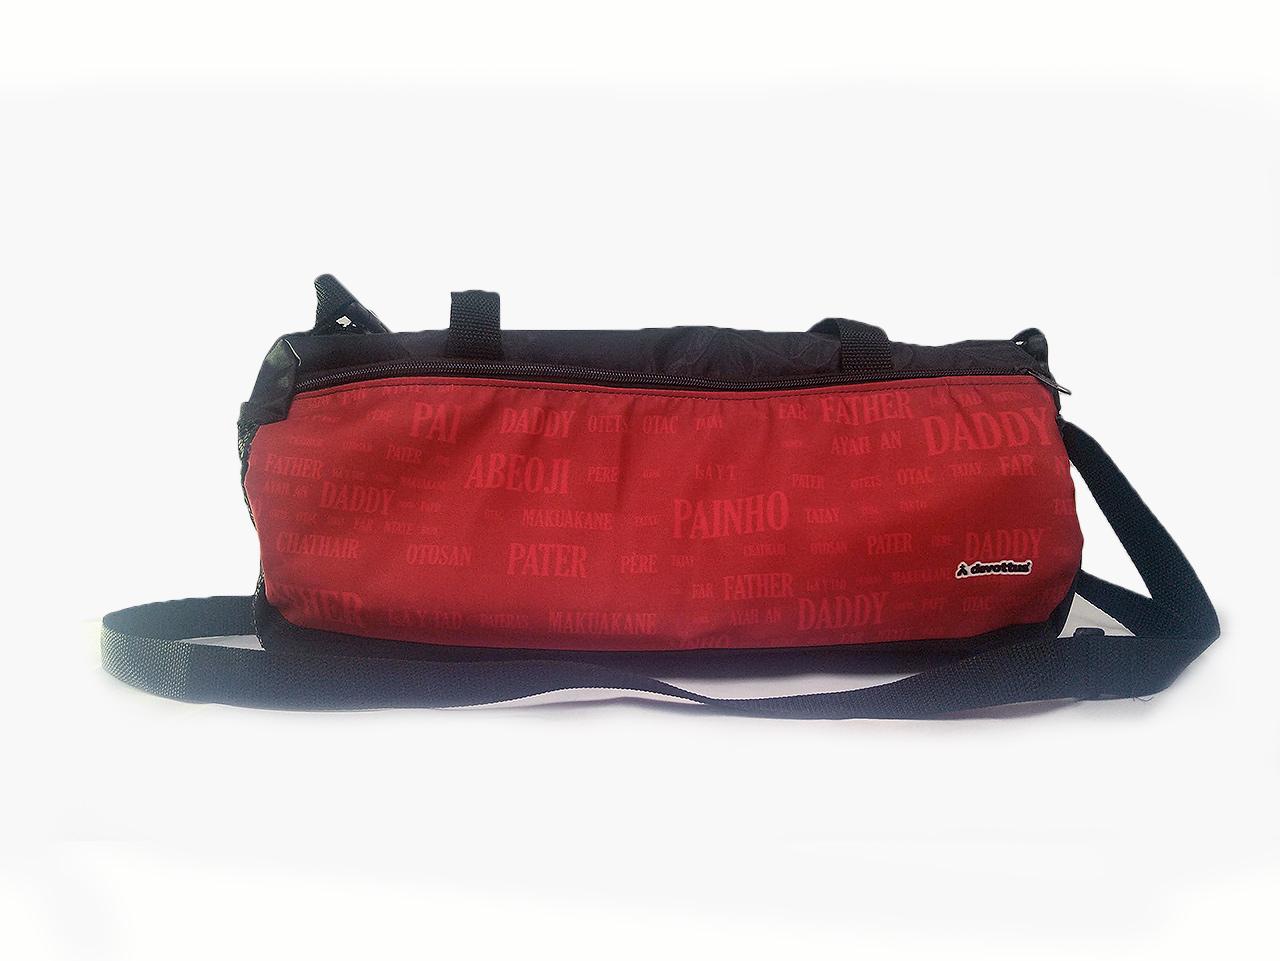 Bolsa Esportiva Bieta - Papai Idiomas (Vermelha)